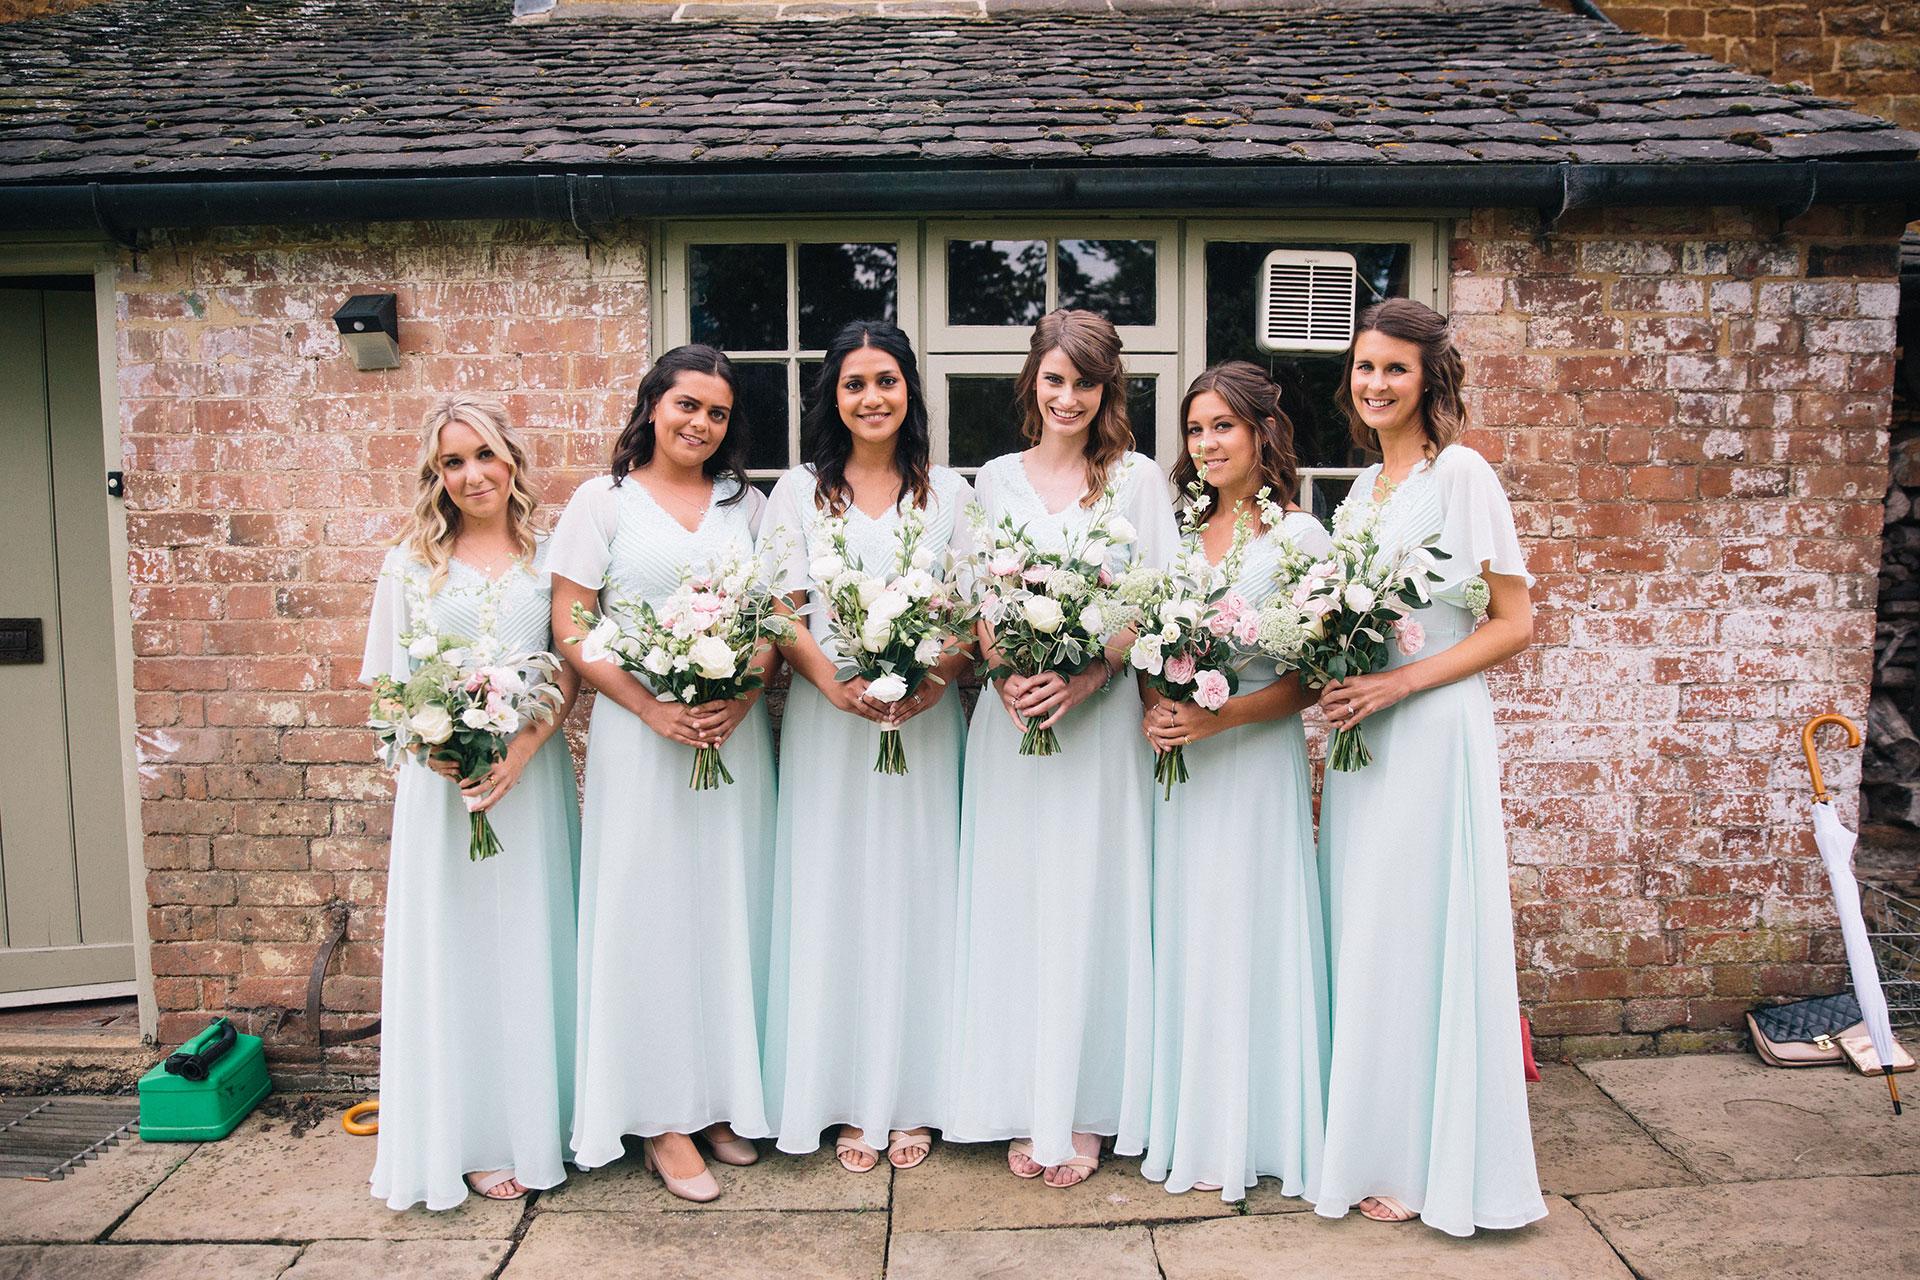 Langar-Hall-wedding-photographer-in-Nottinghamshire-Michael-Newington-Gray-37.jpg